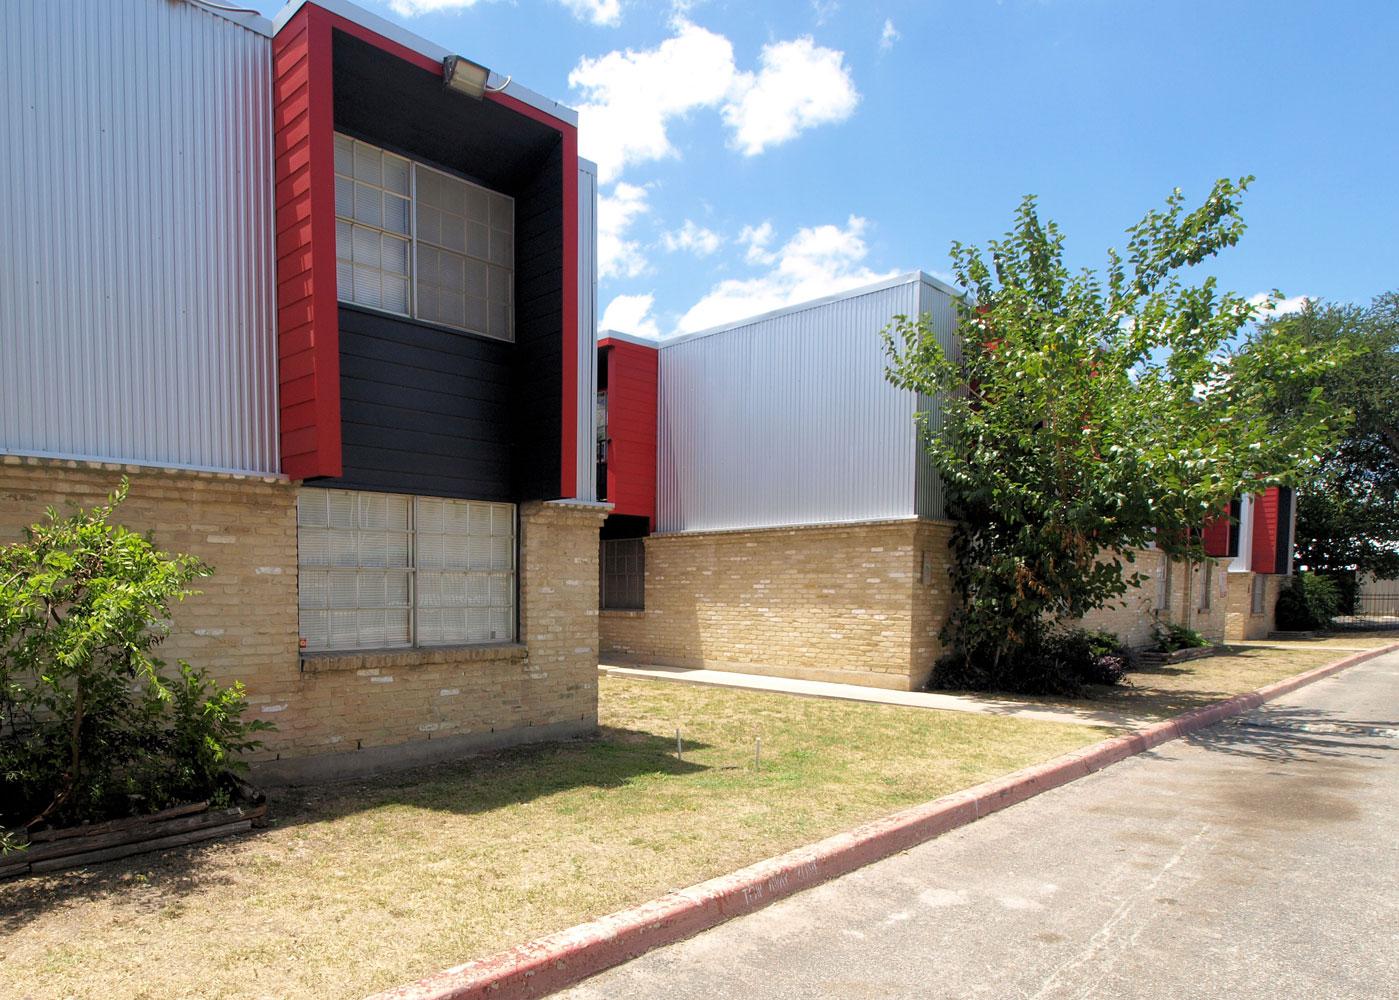 San Antonio, TX Apartment Photos, Videos, Plans | Presidio